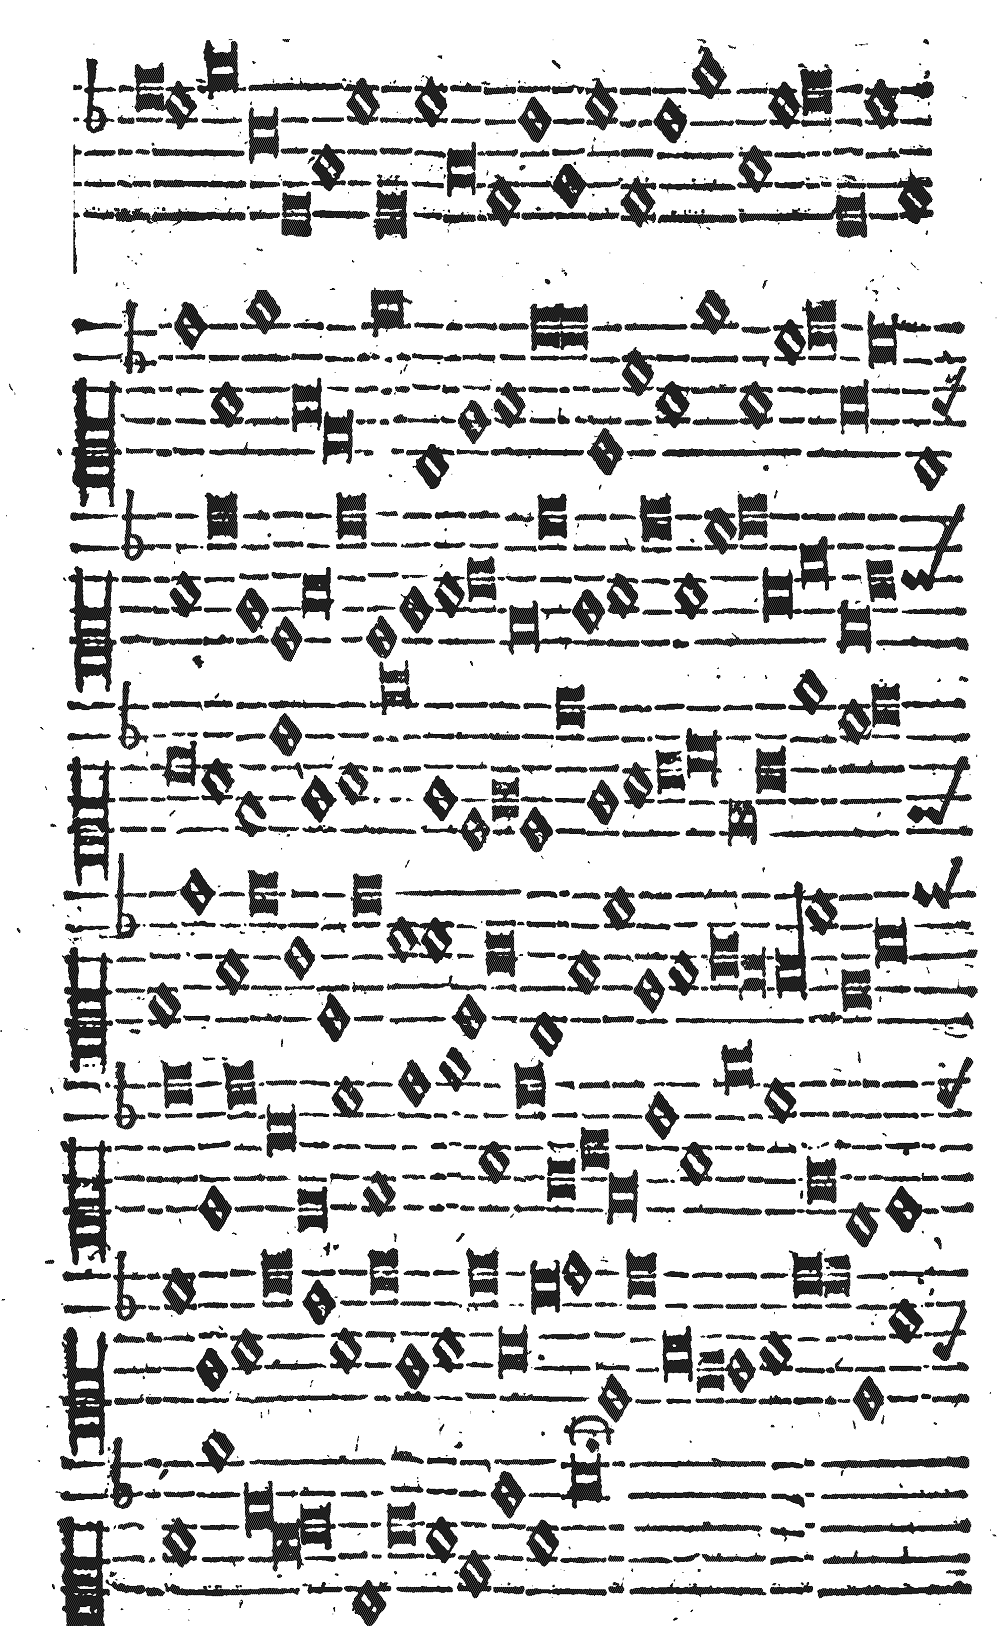 Schwendter-music-ciphertext